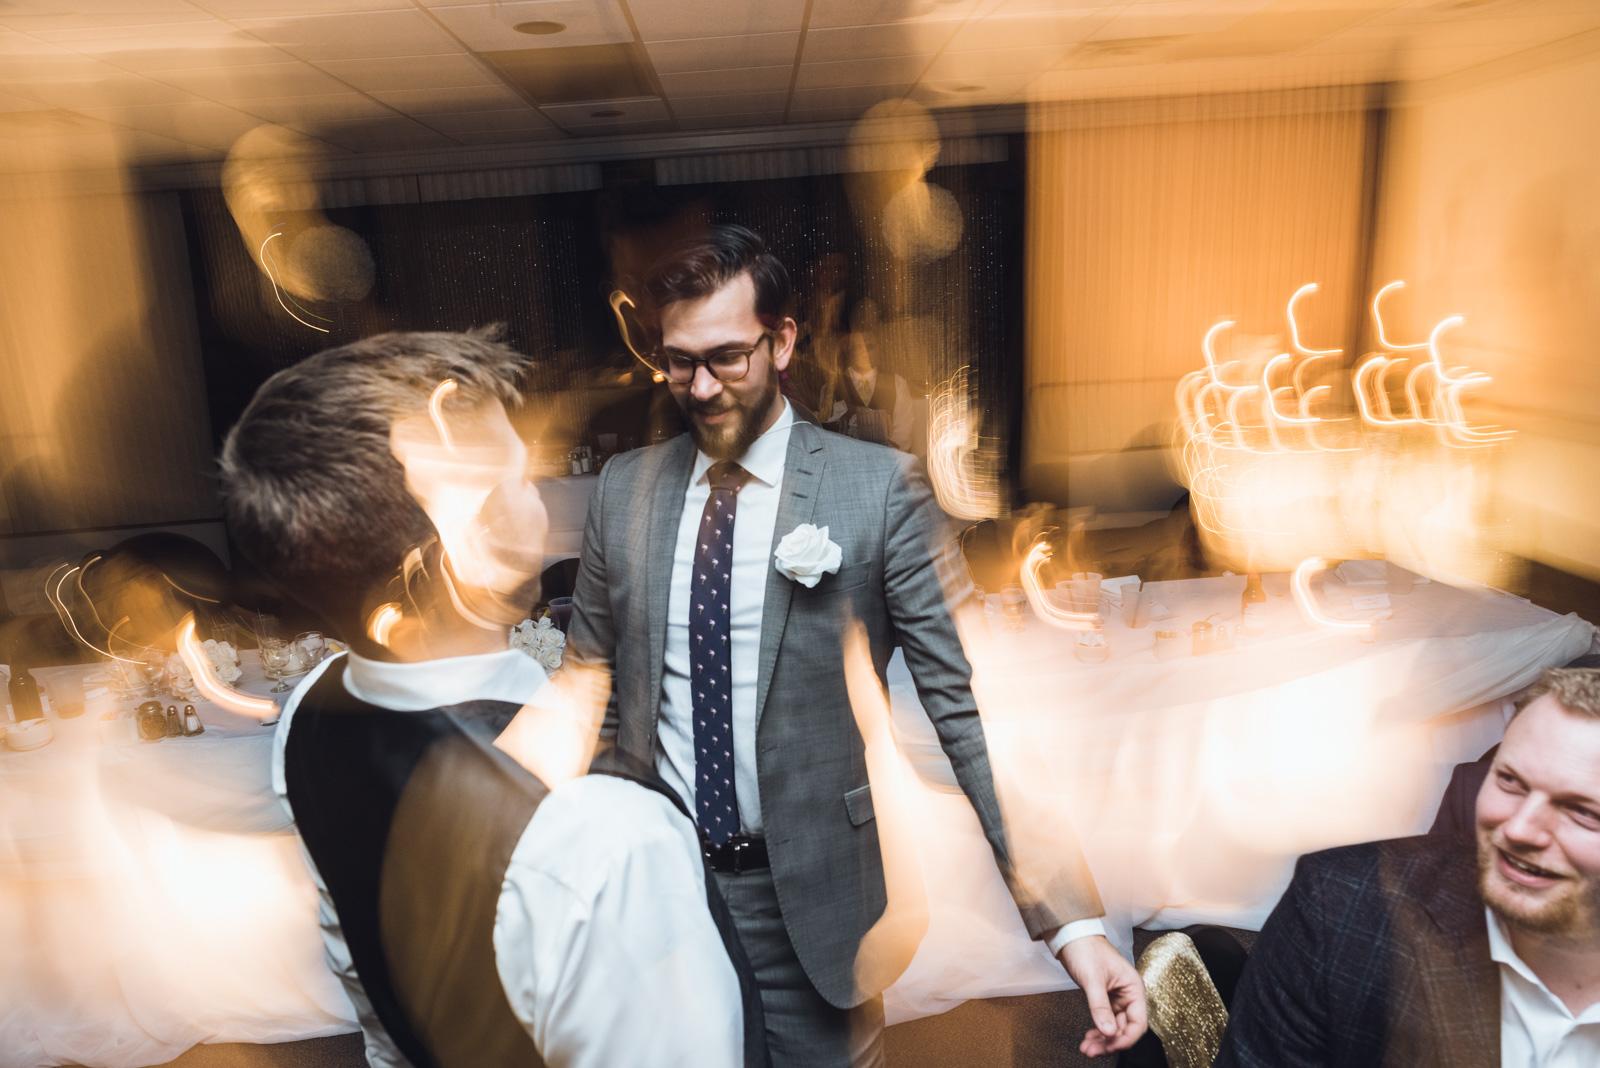 rheana-chris-wedding-blog-320.jpg